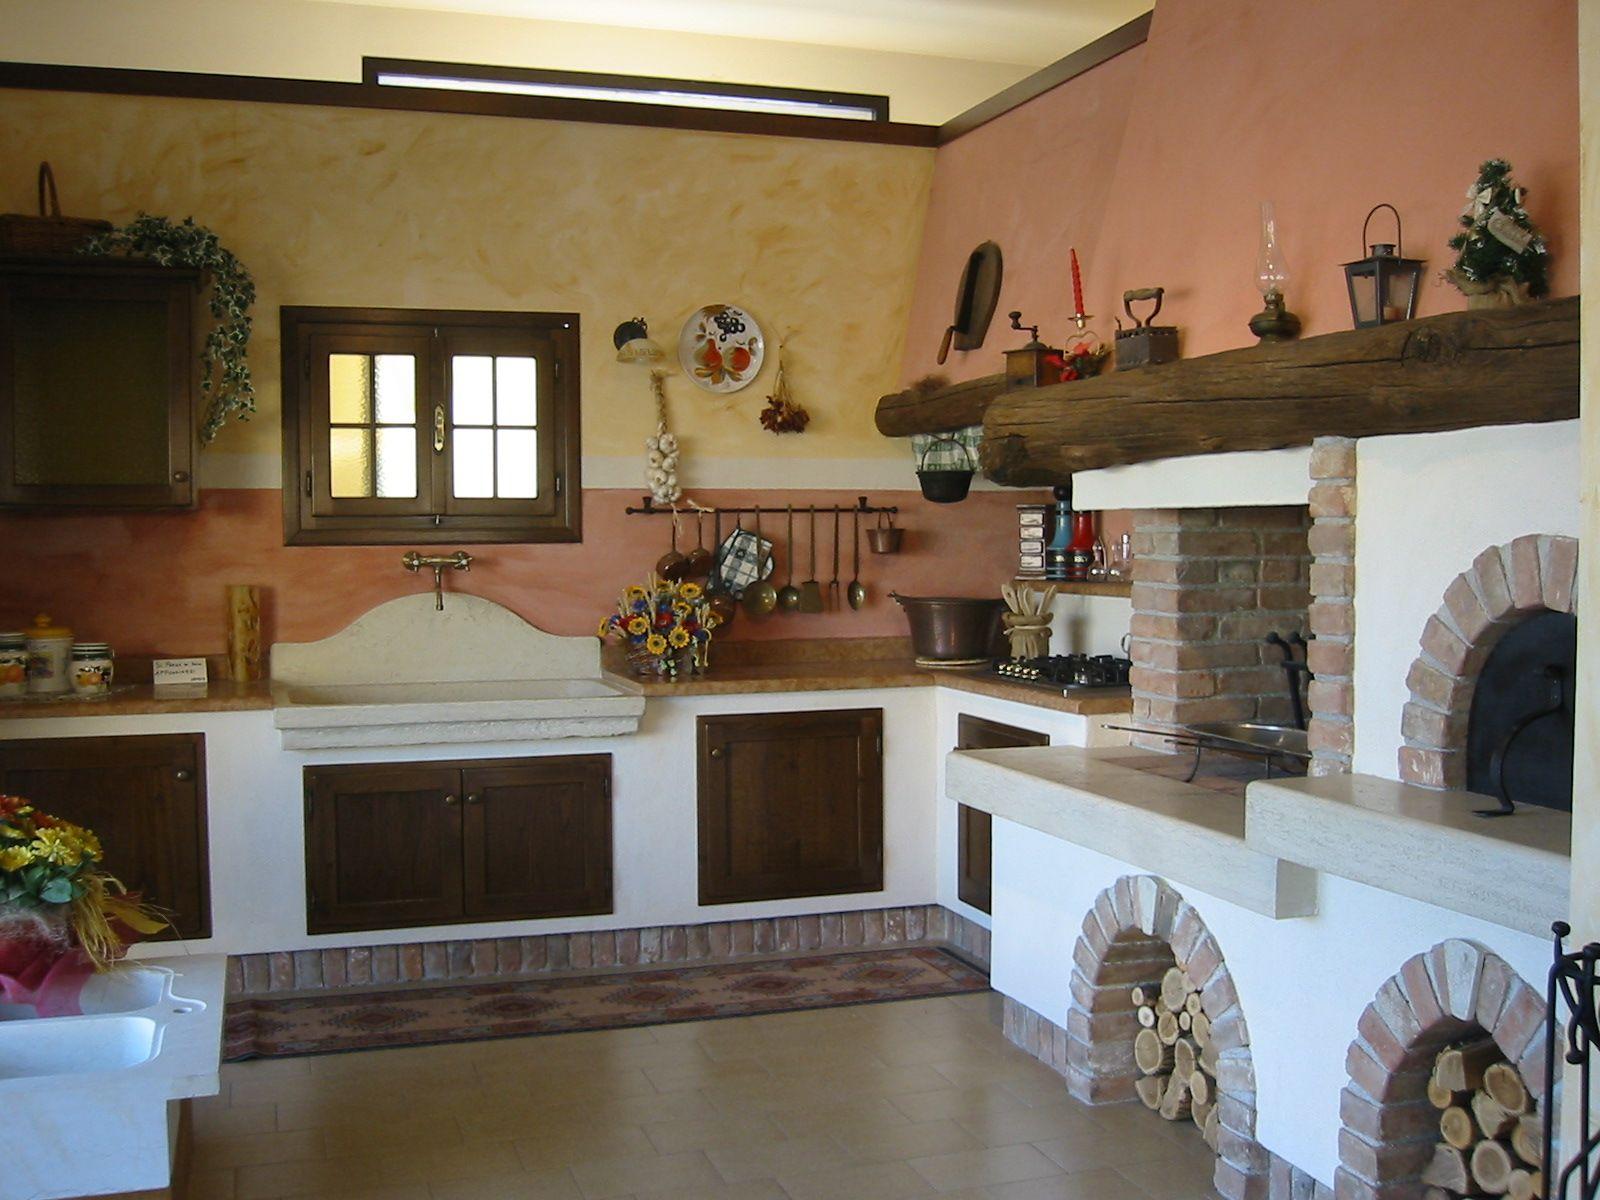 Cucine da sogno rustiche cerca con google casa dolce casa pinterest searching - Tende da cucina rustica ...